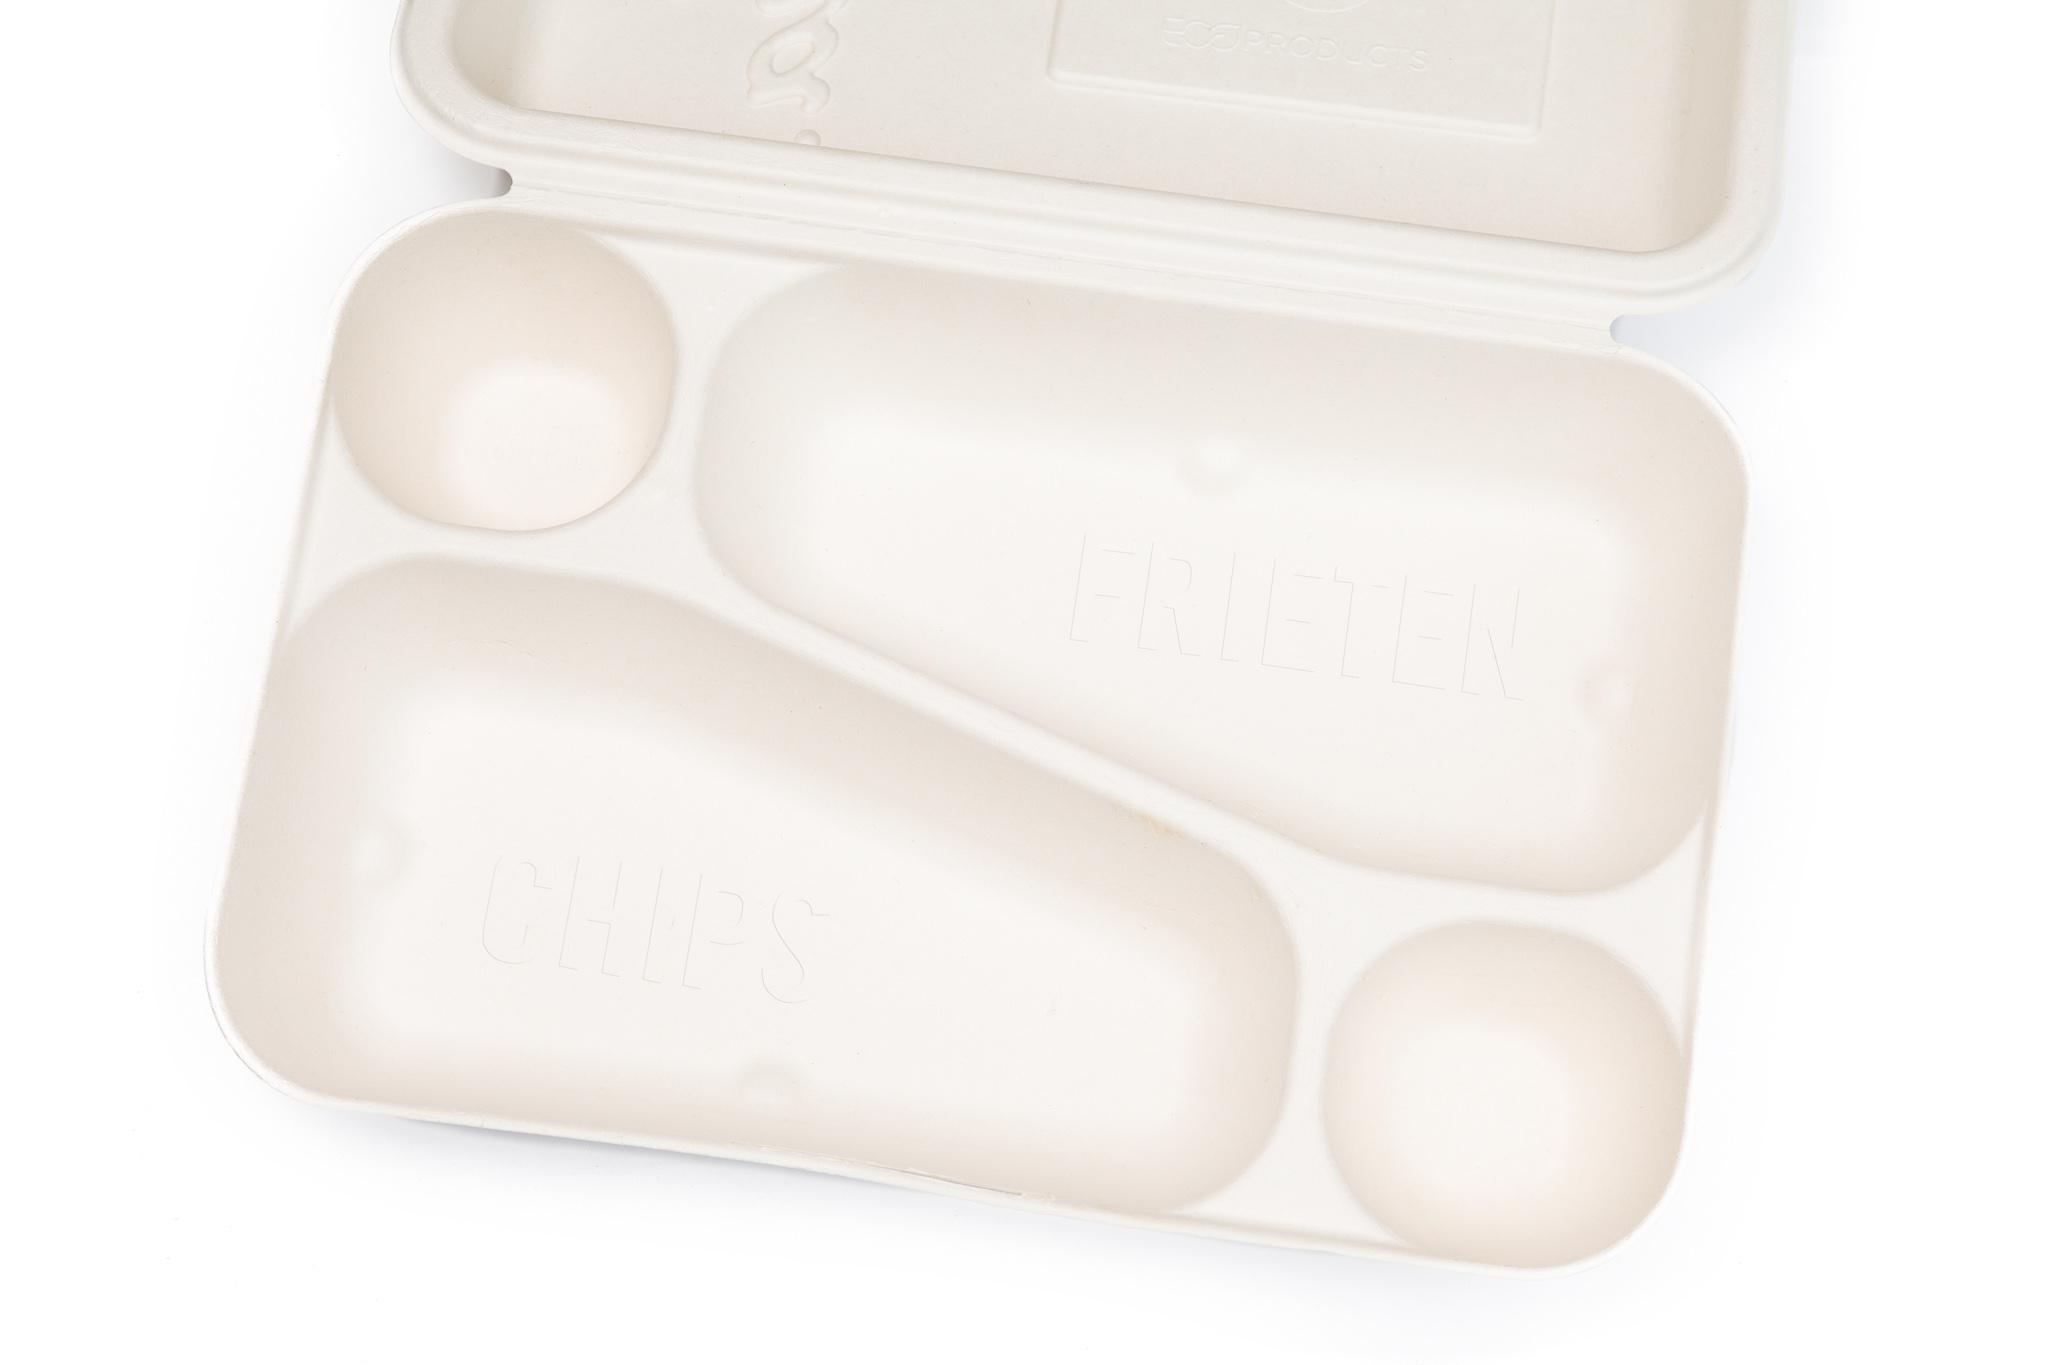 AW14-Rapha-Cross-Shoe-Packaging-16